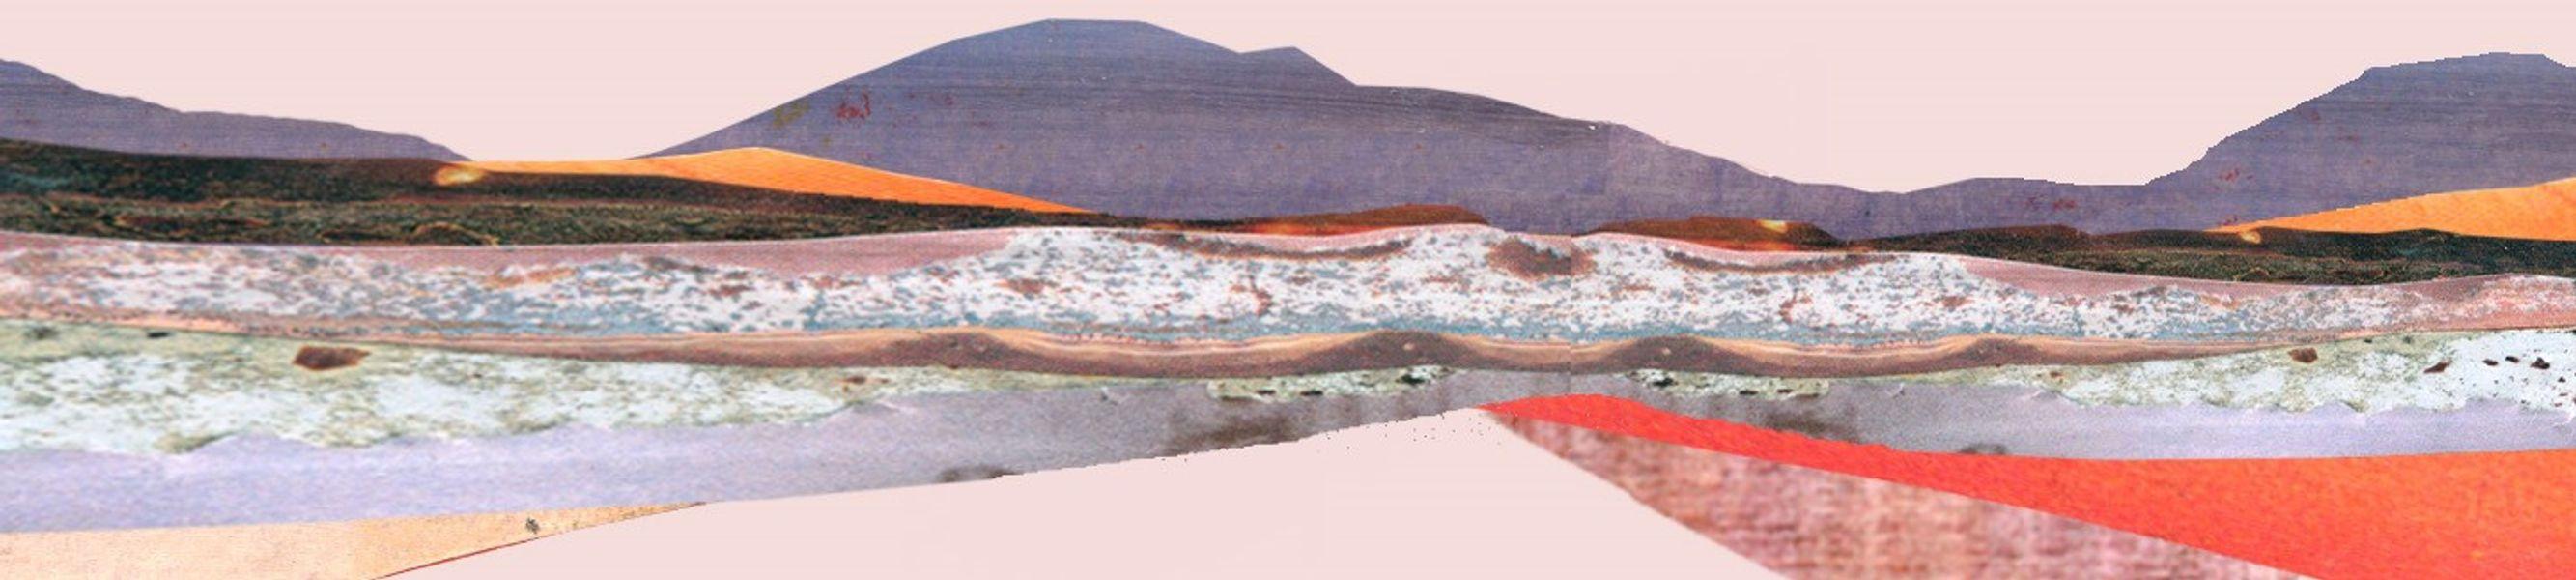 Salt Flats Commission [Back Splash]